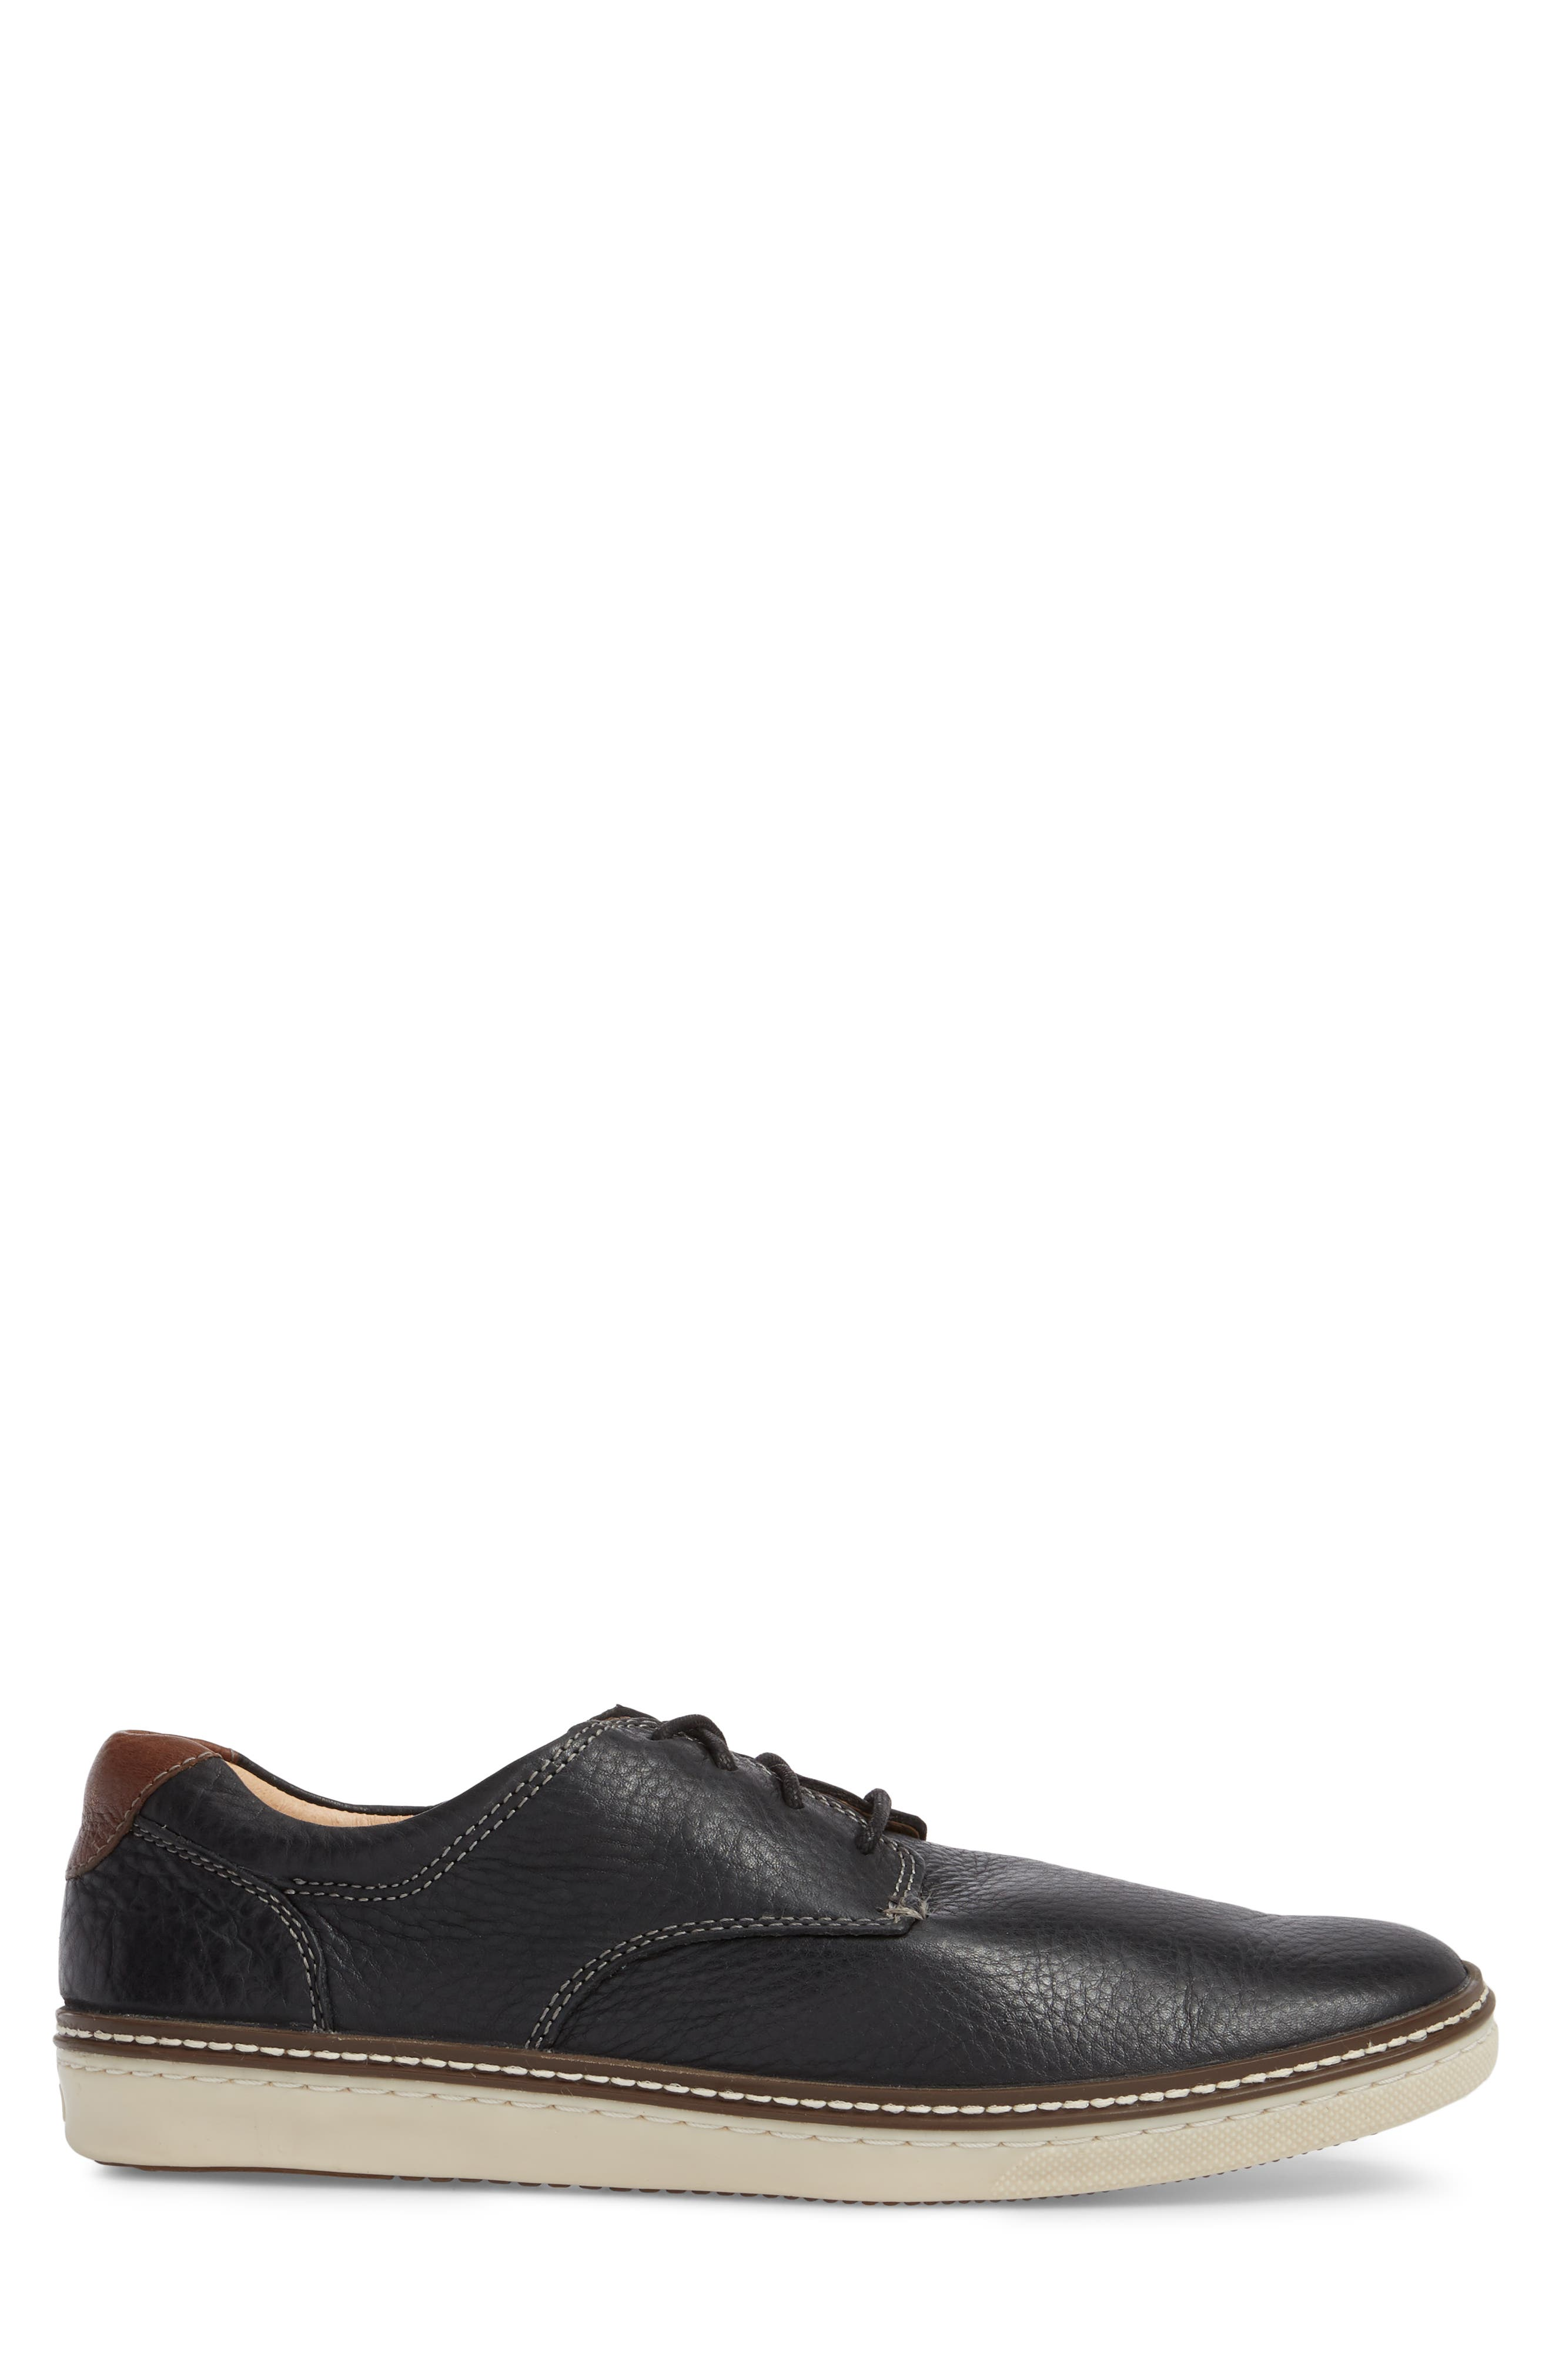 McGuffey Derby Sneaker,                             Alternate thumbnail 3, color,                             BLACK LEATHER